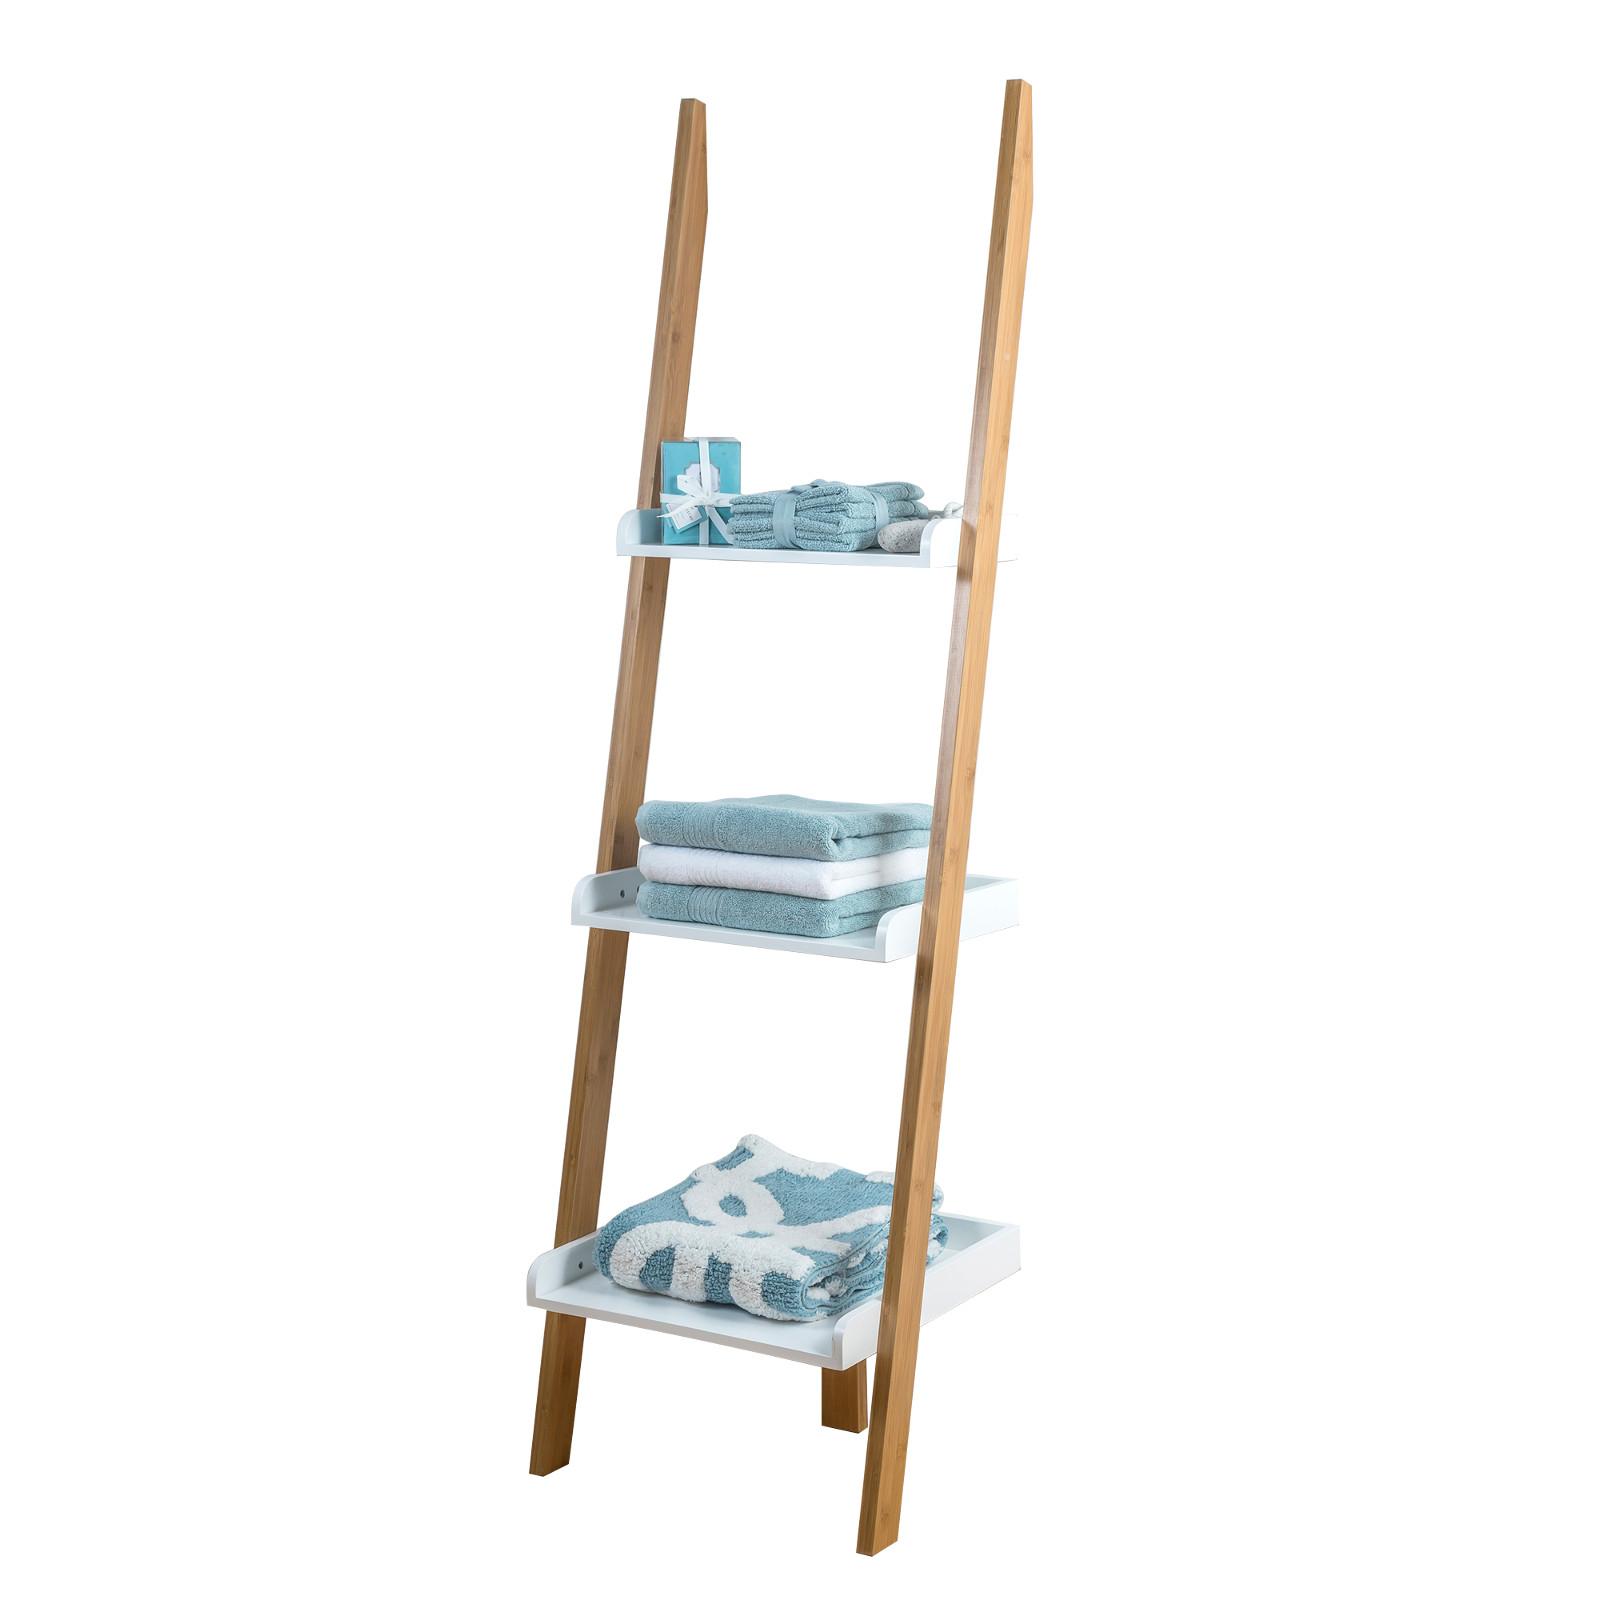 Pleasant Buy Bamboo 3 Tier Kobe Leaning Bathroom Shelf Unit Back2Bath Interior Design Ideas Clesiryabchikinfo